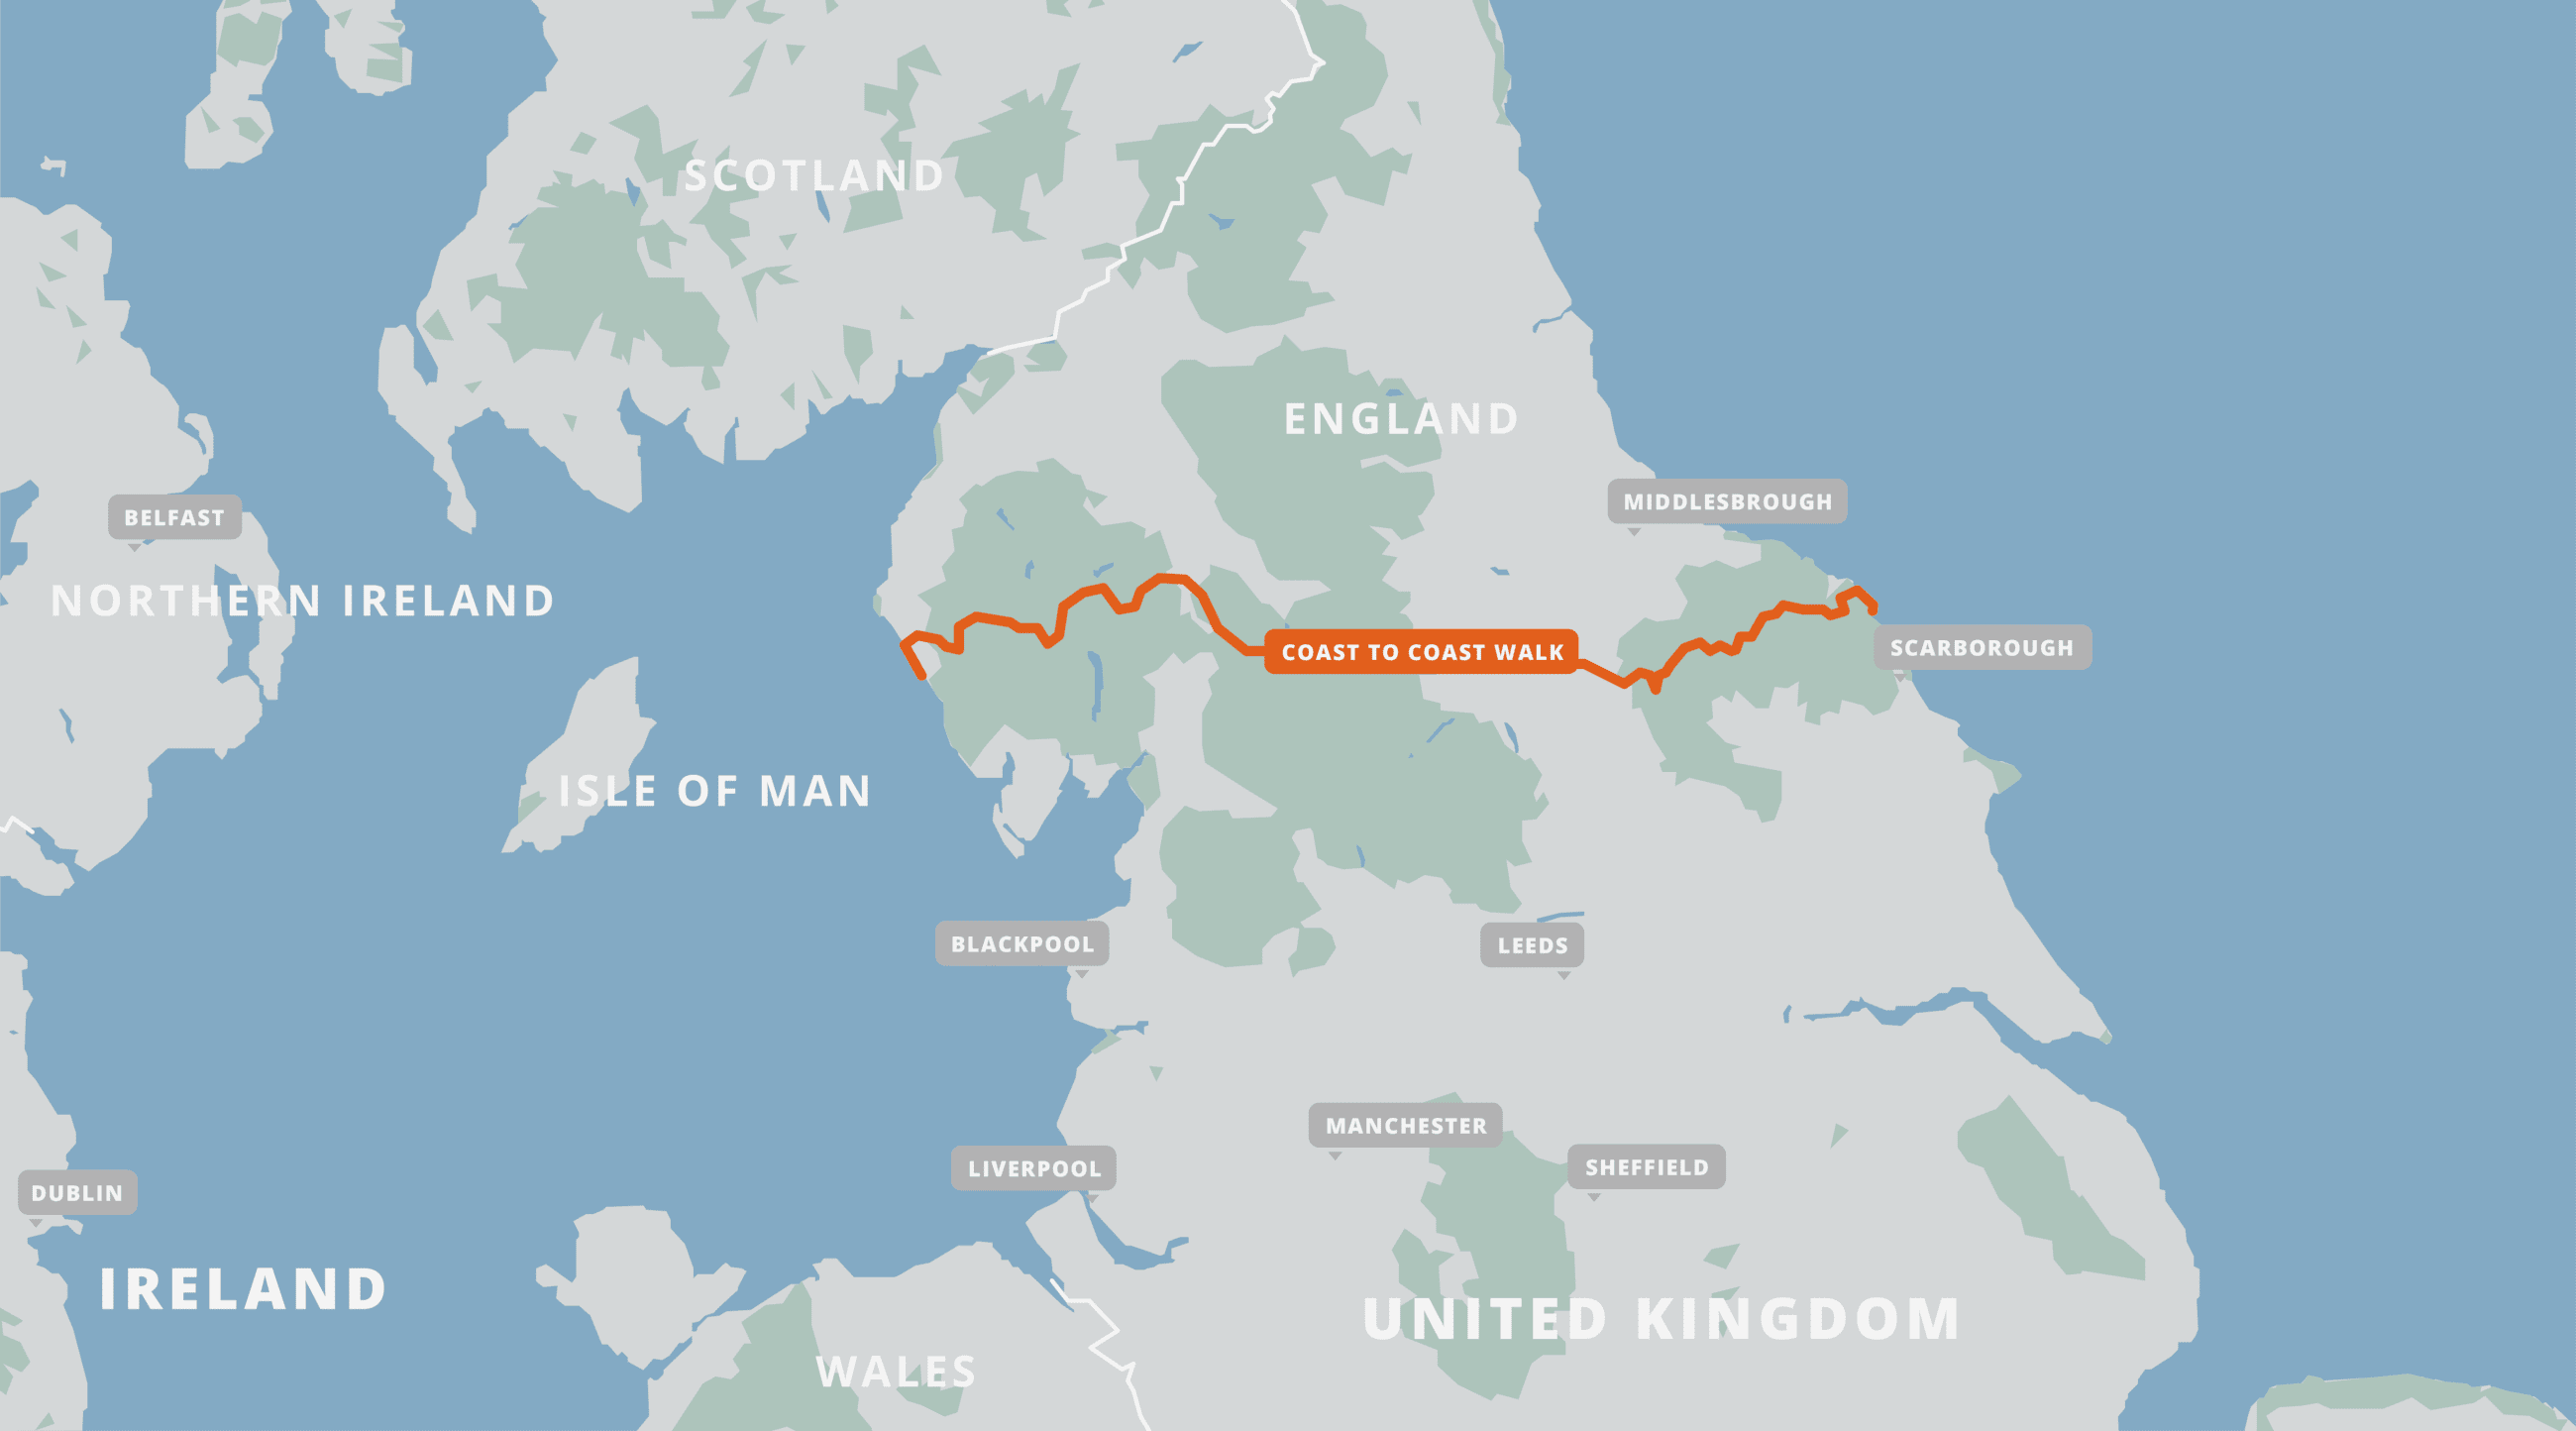 A map of the Coast to Coast Walk.